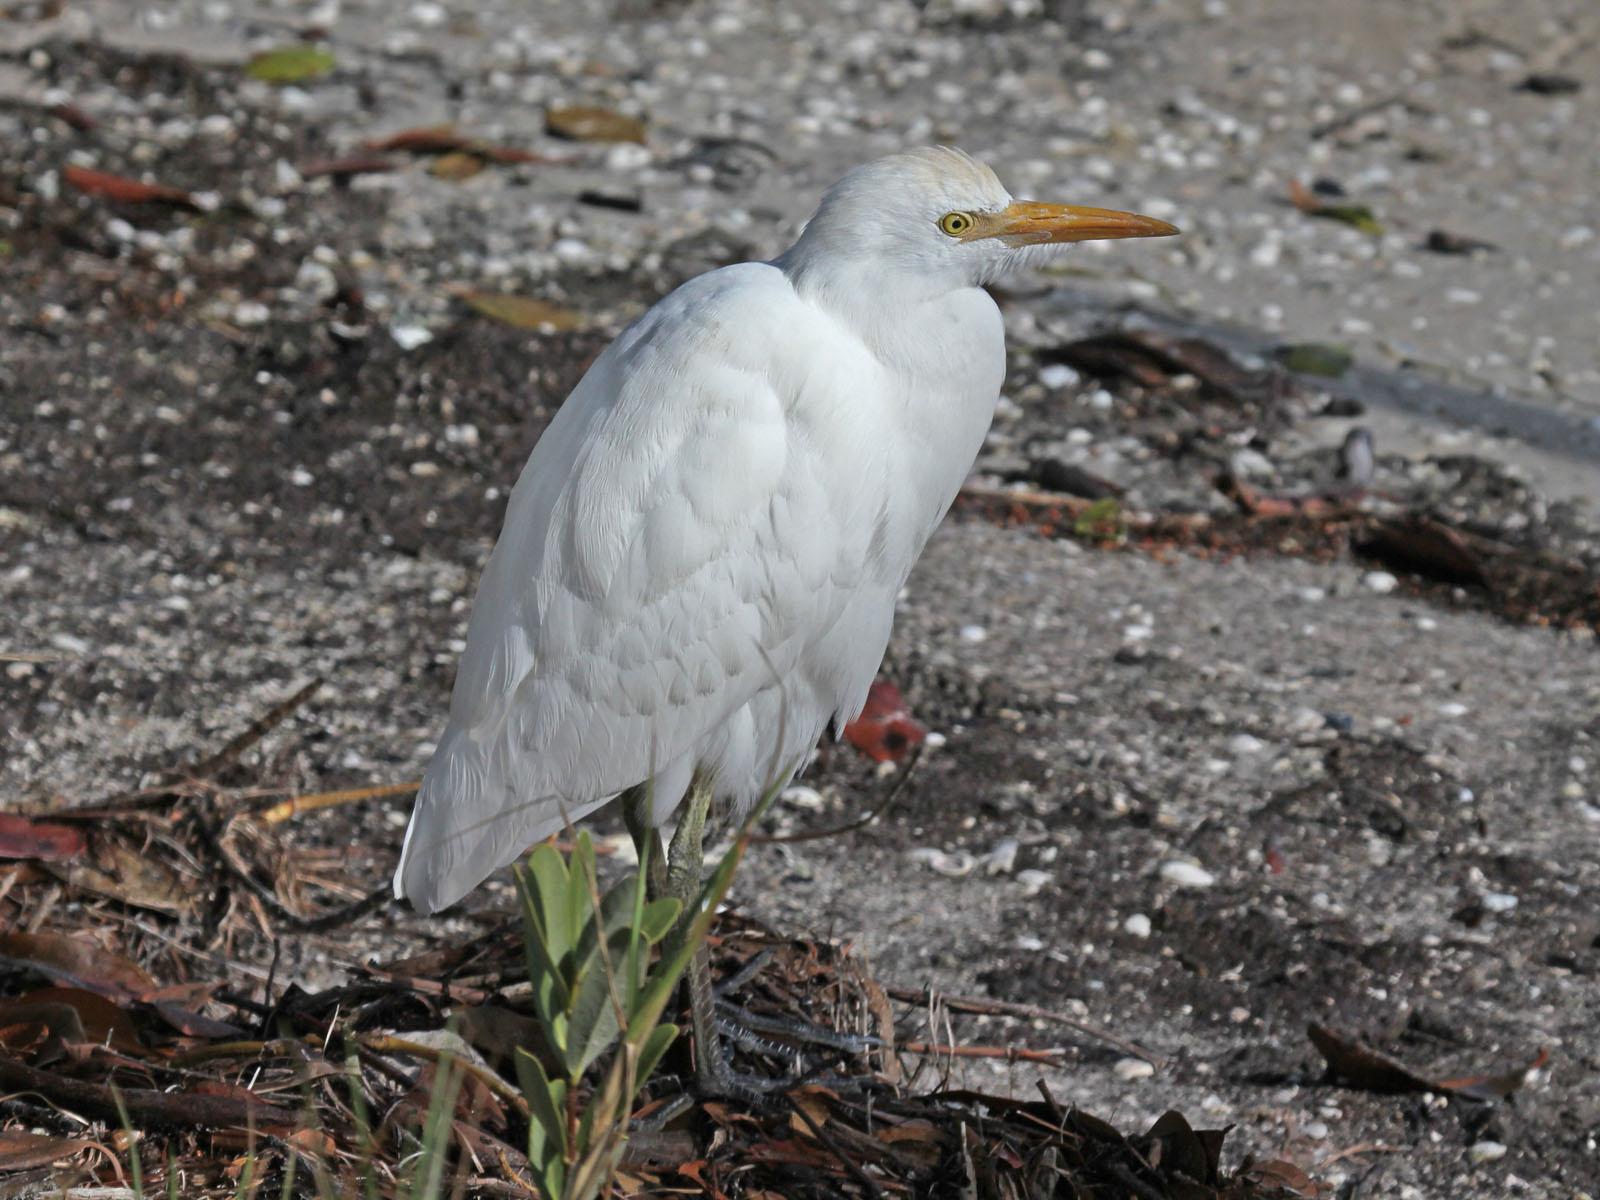 Birds of The World: Egrets (Ardeidae)